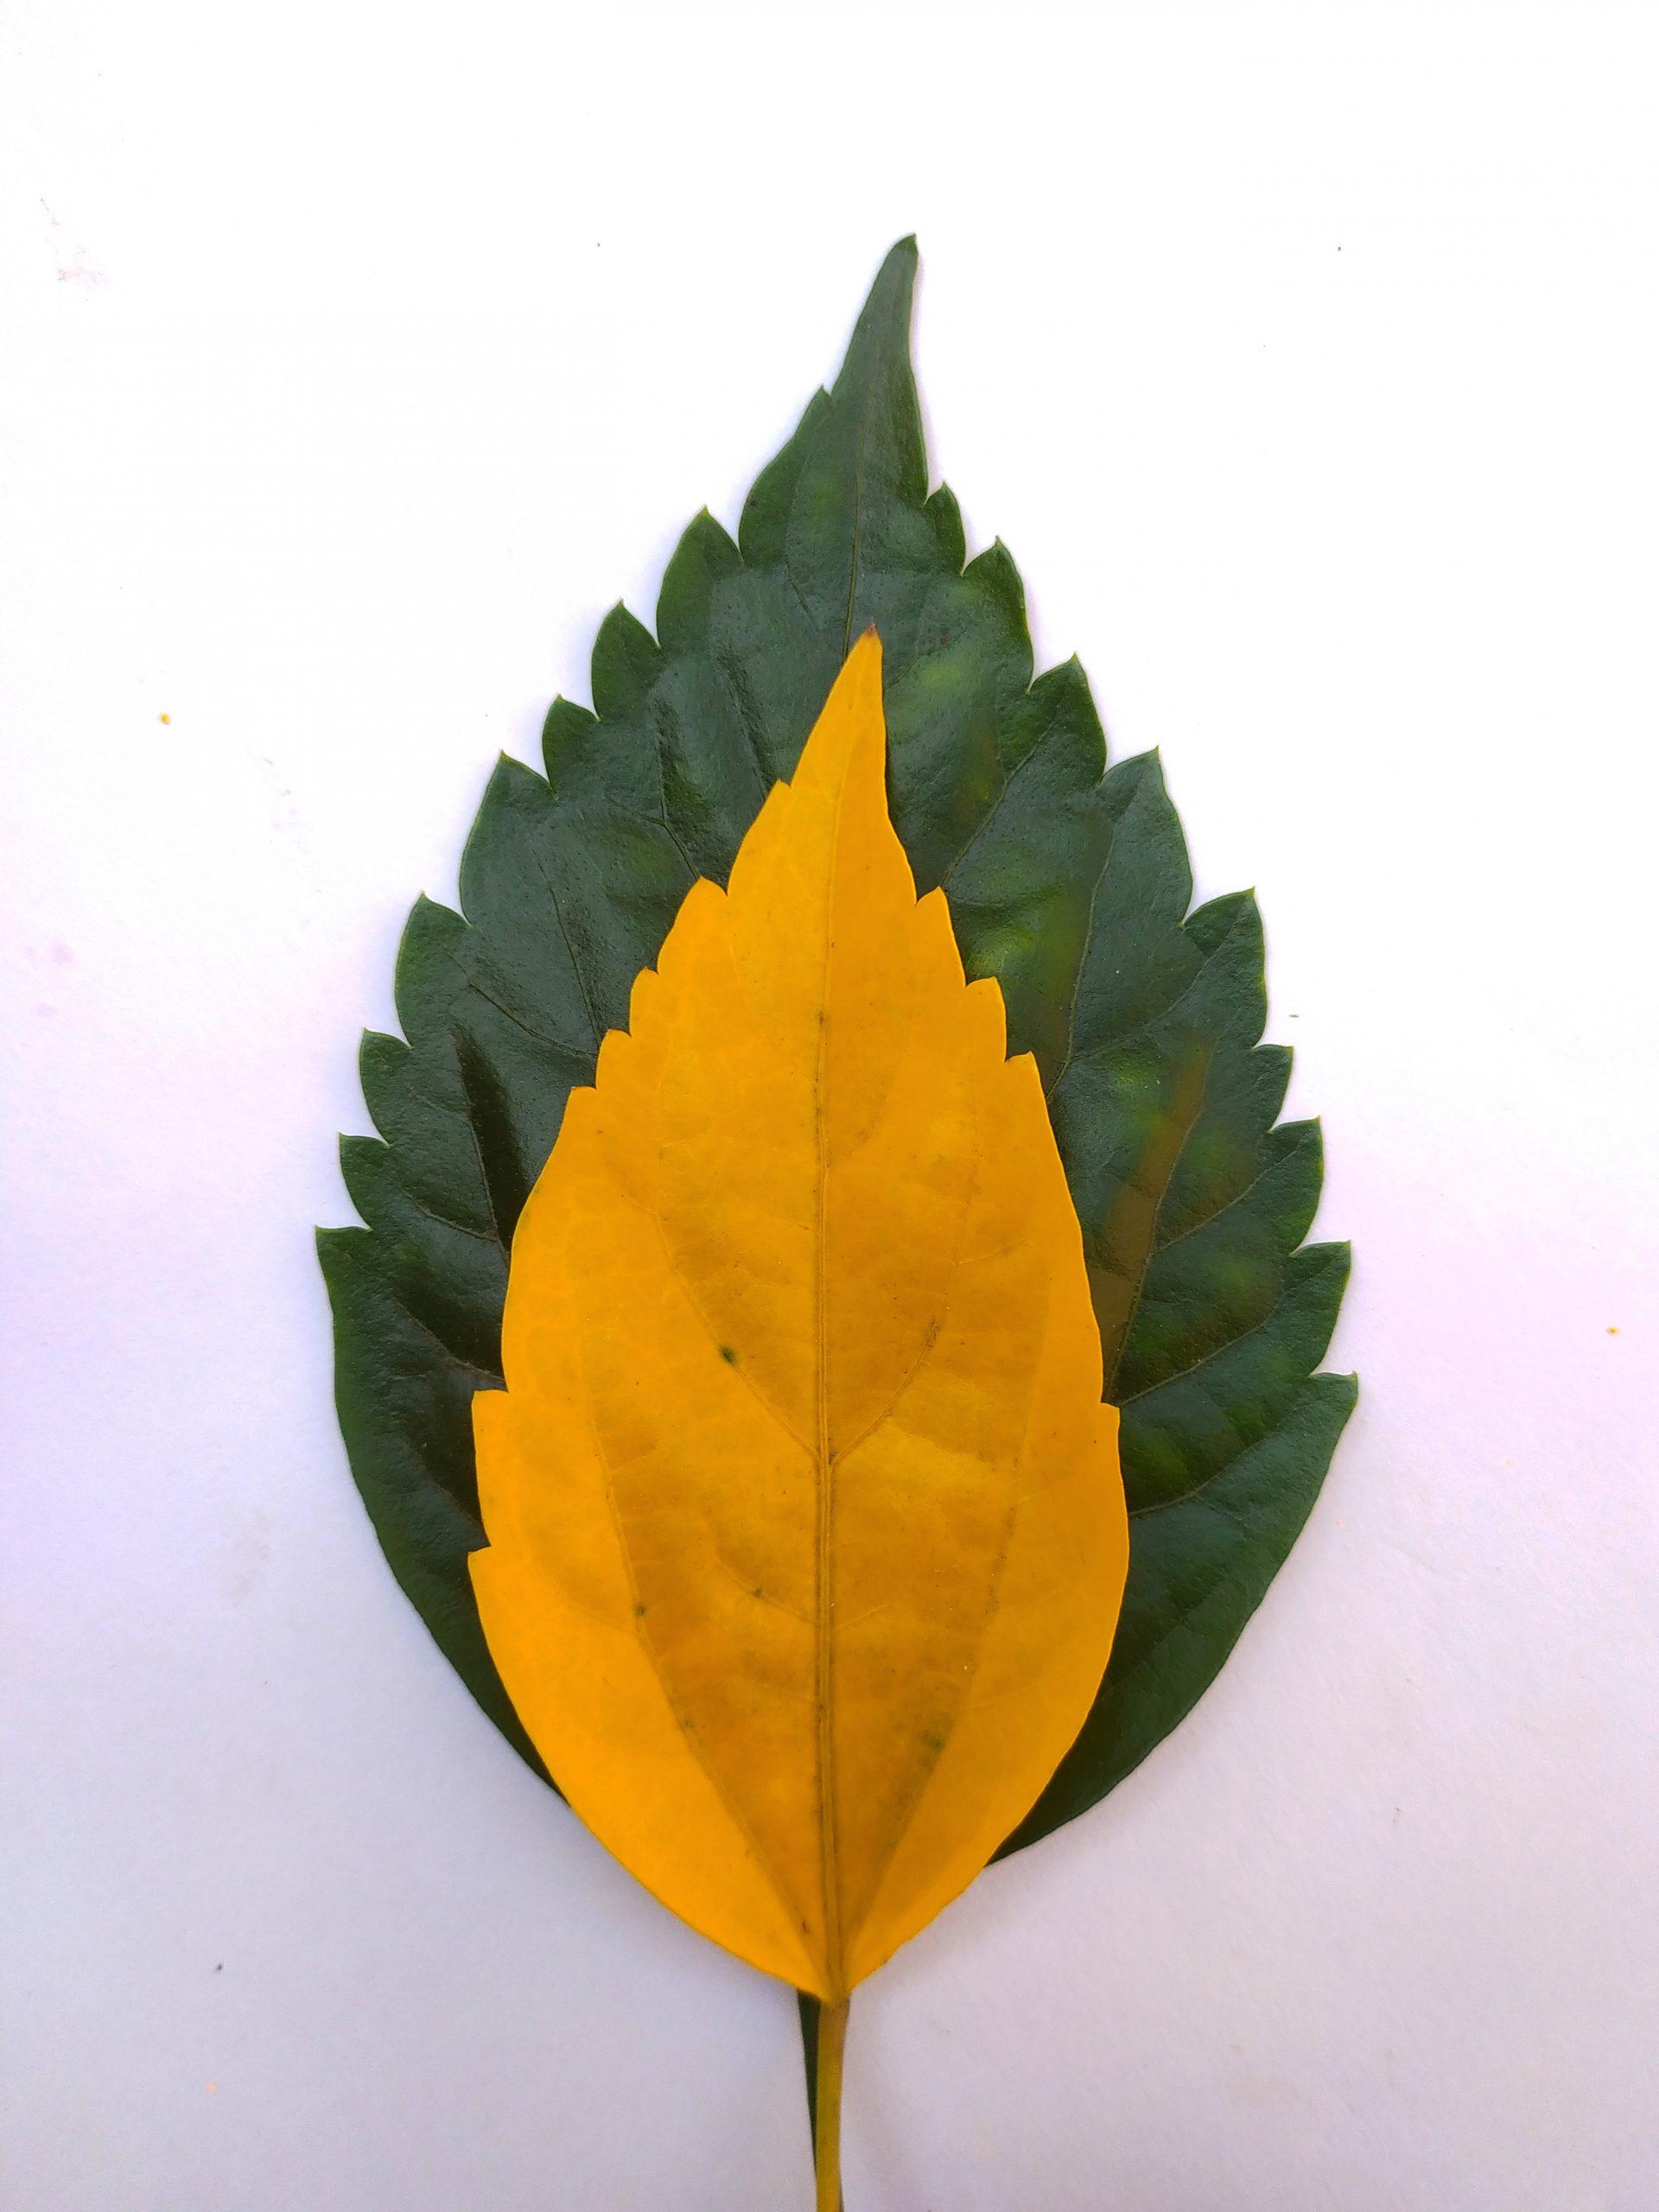 A hibiscus leaf